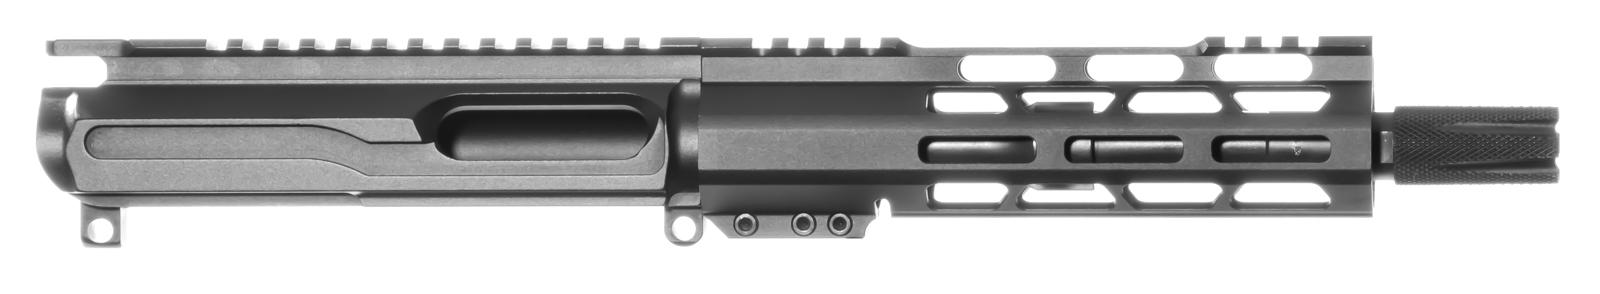 ar9-upper-assembly-wolverine-9mm-110-160714